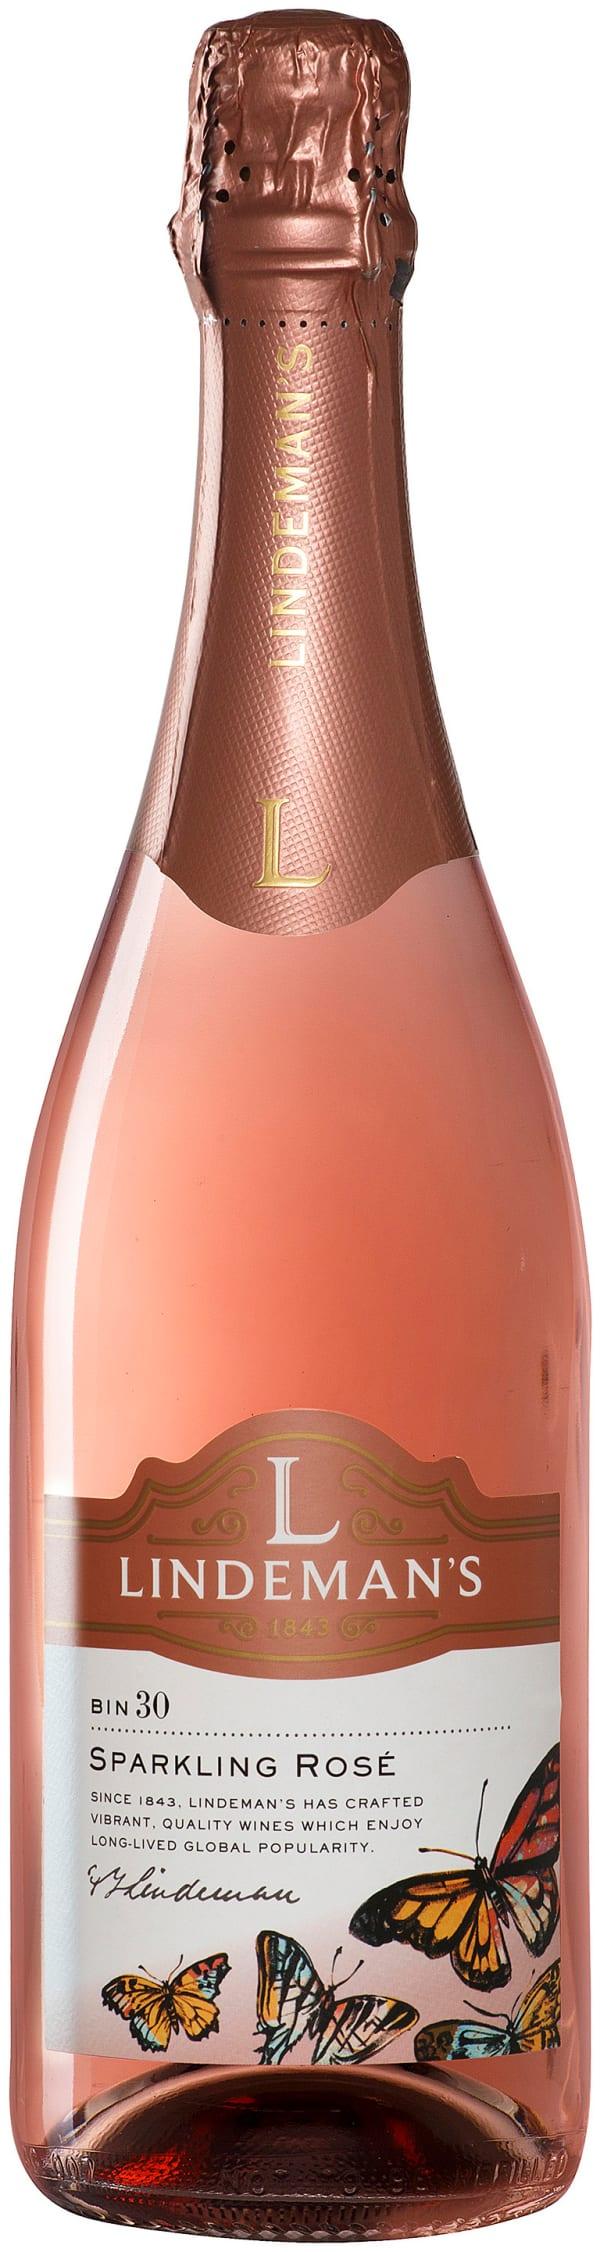 Lindeman's Bin 30 Sparkling Rosé Extra Dry